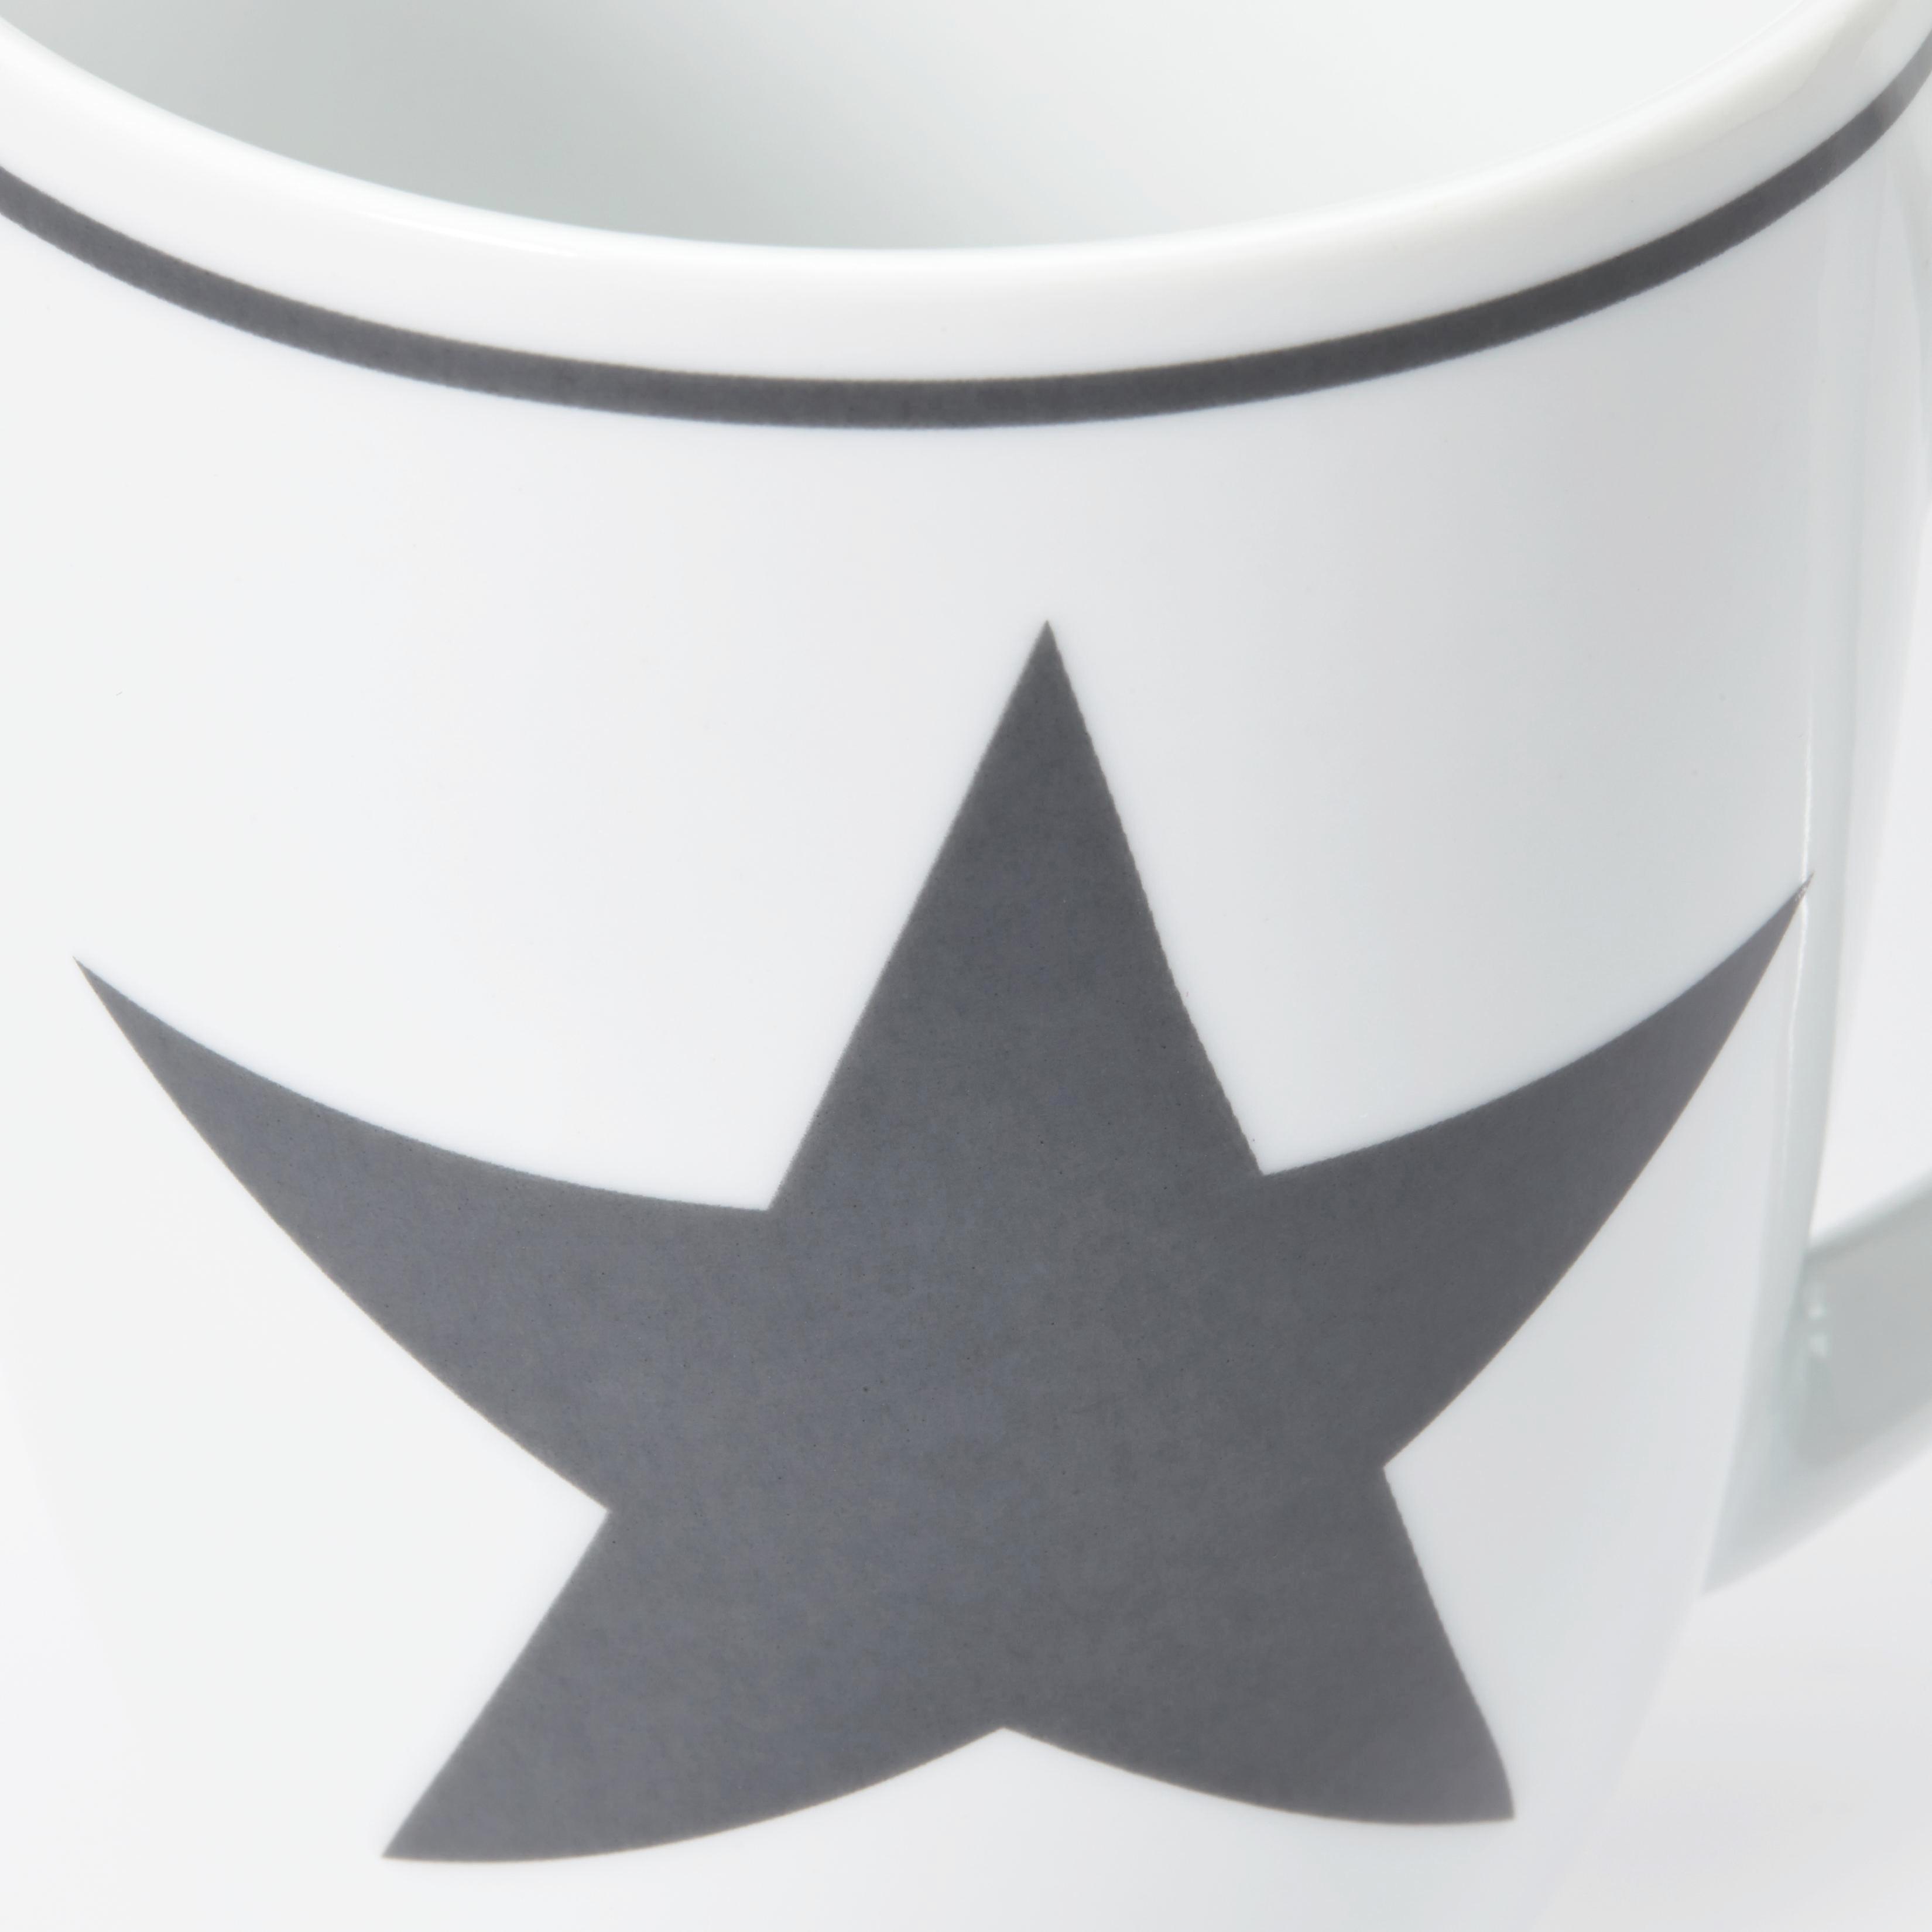 Kaffeebecher Star - Anthrazit/Weiß, MODERN, Keramik (8,4/10,5cm) - MÖMAX modern living